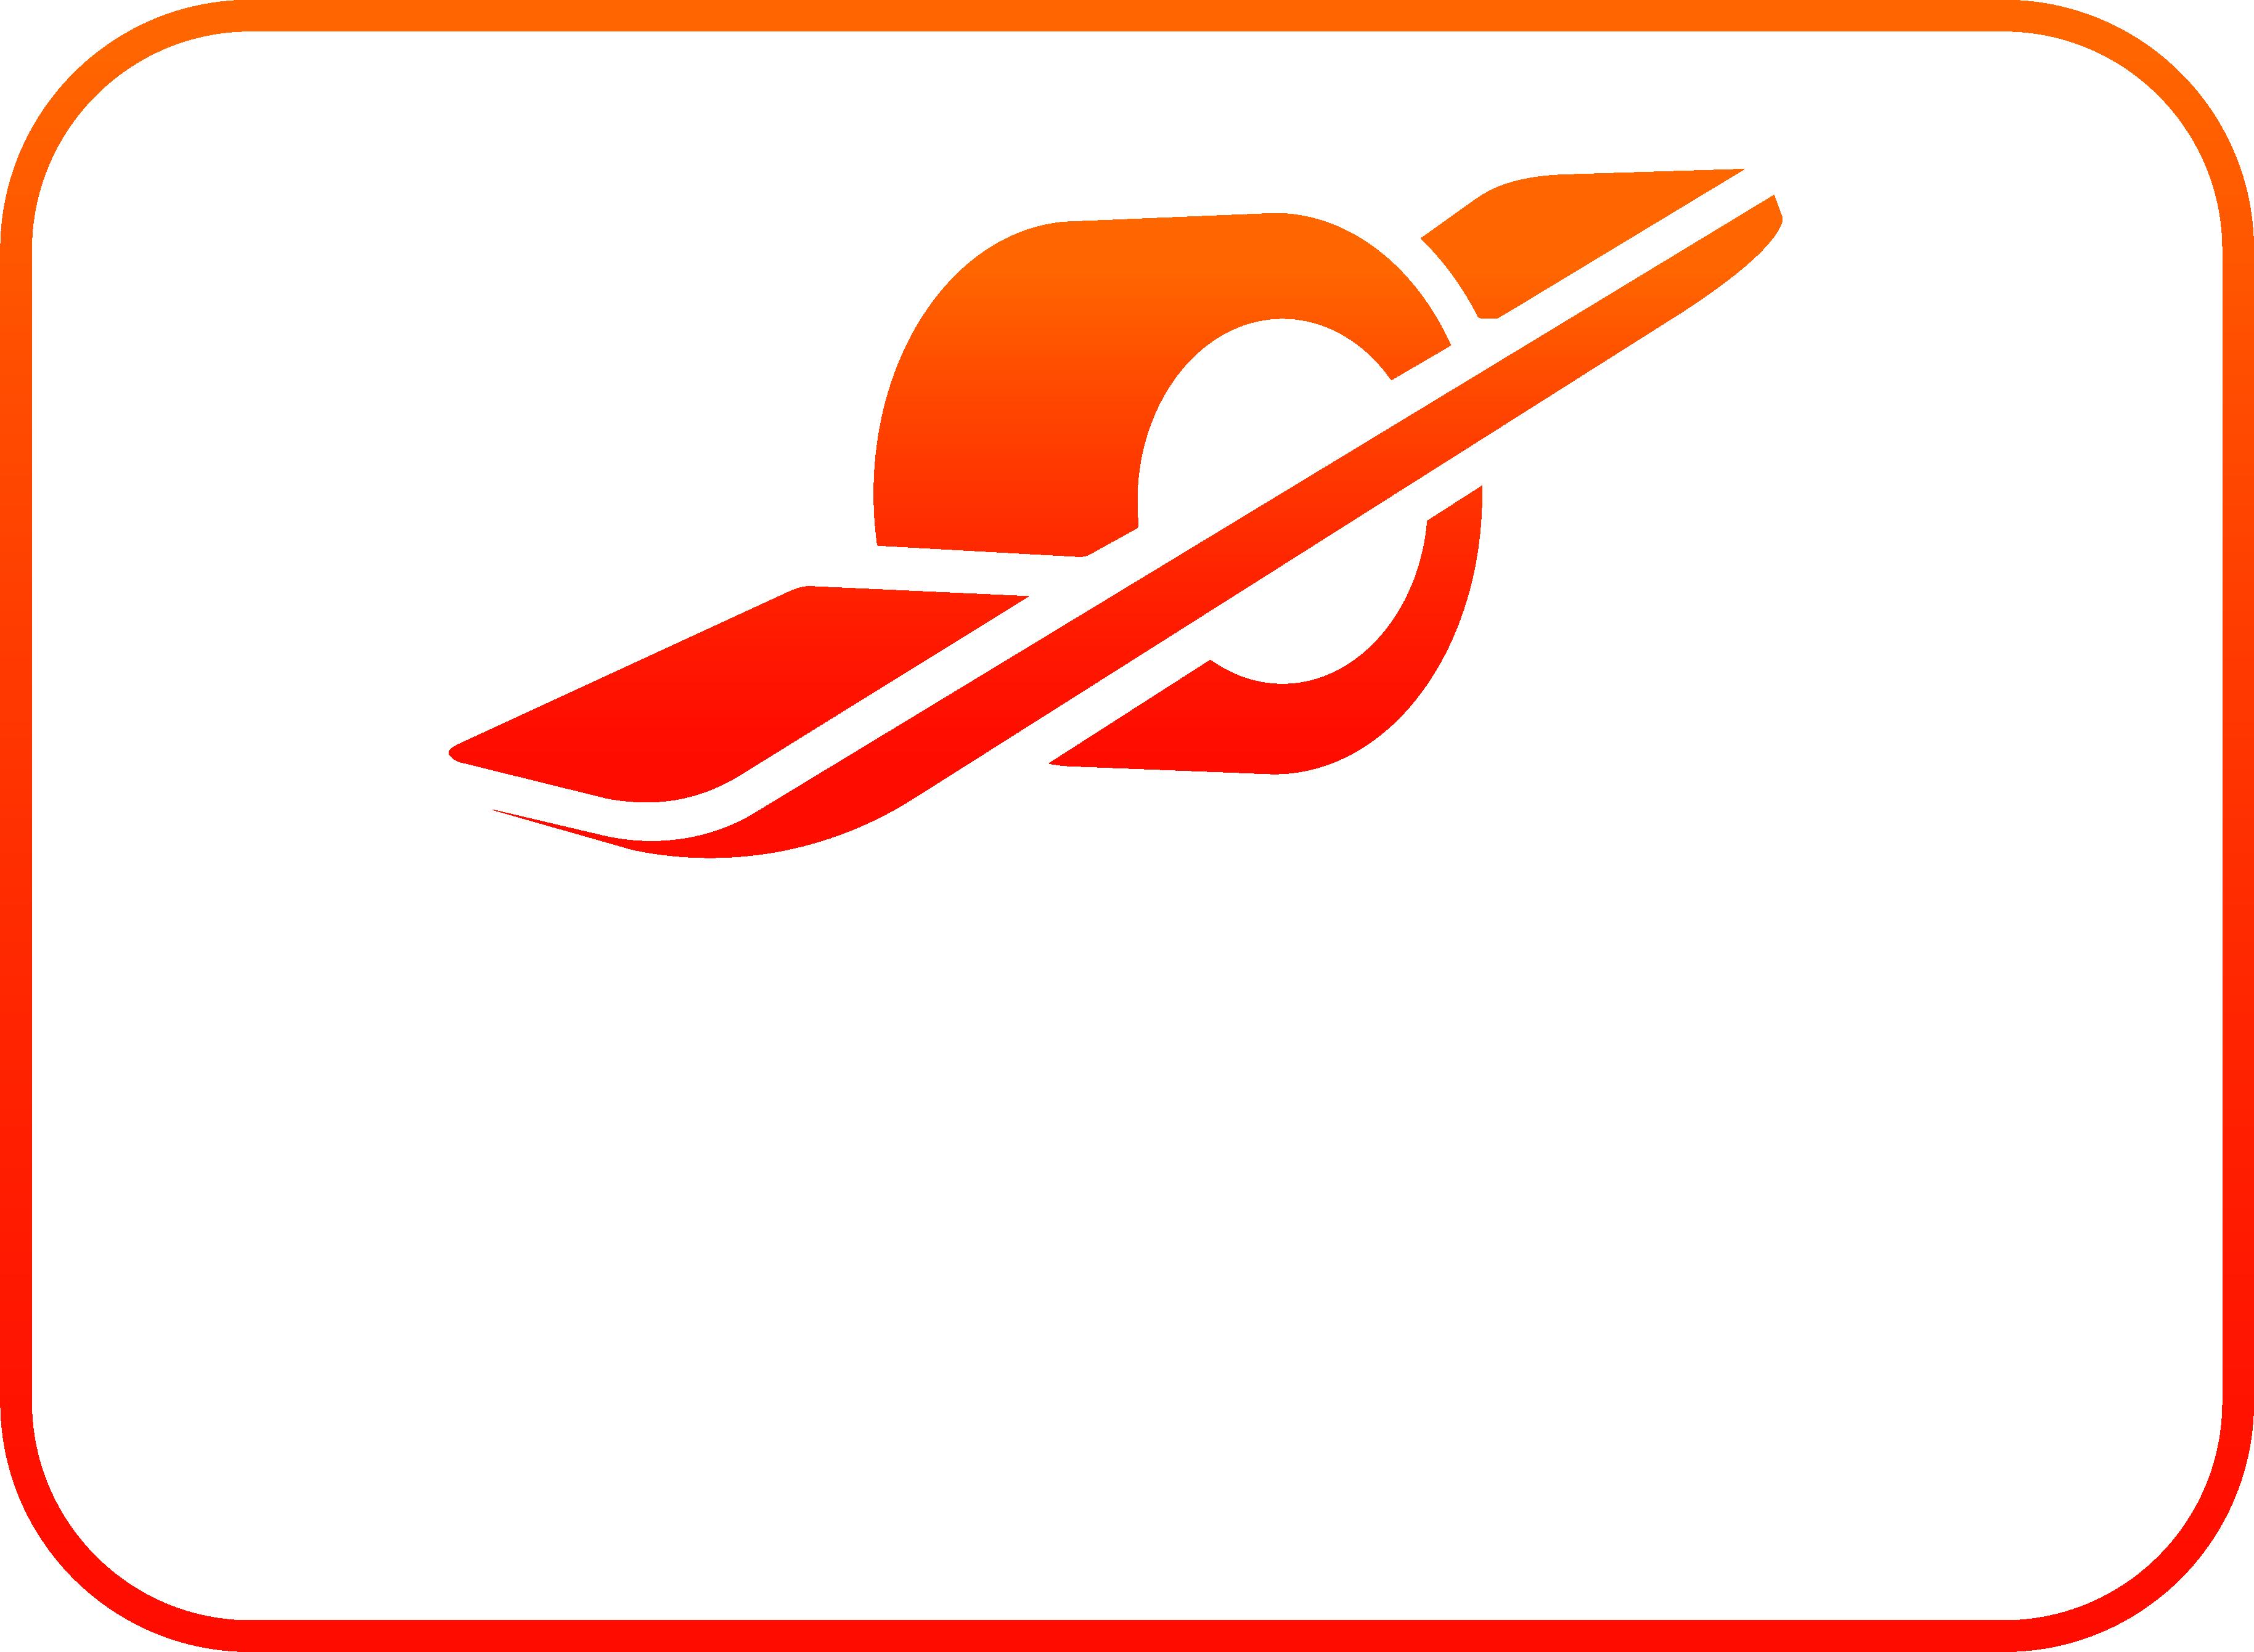 ONEWHEEL HARDWARE